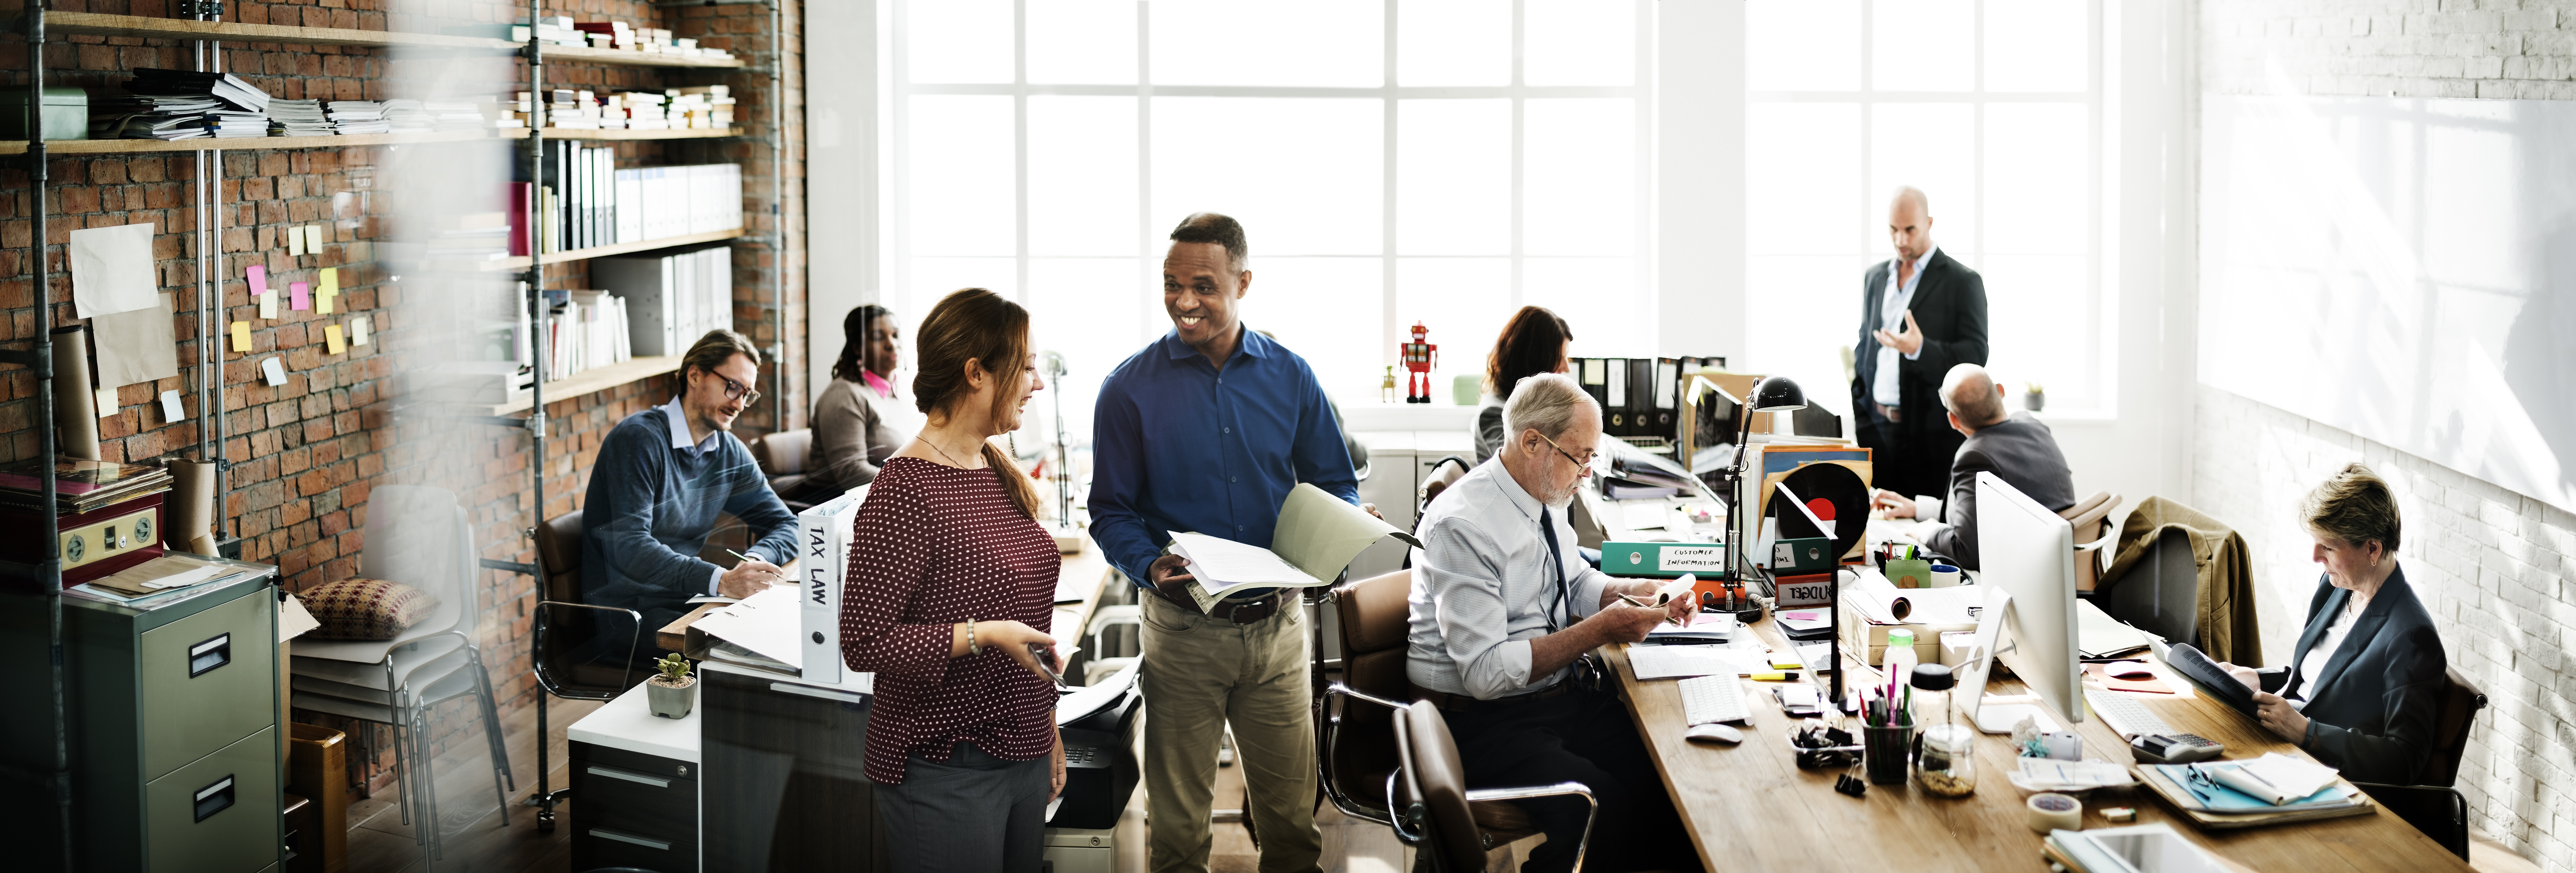 Lärm Am Arbeitsplatz Beruf Nürnberger Versicherung